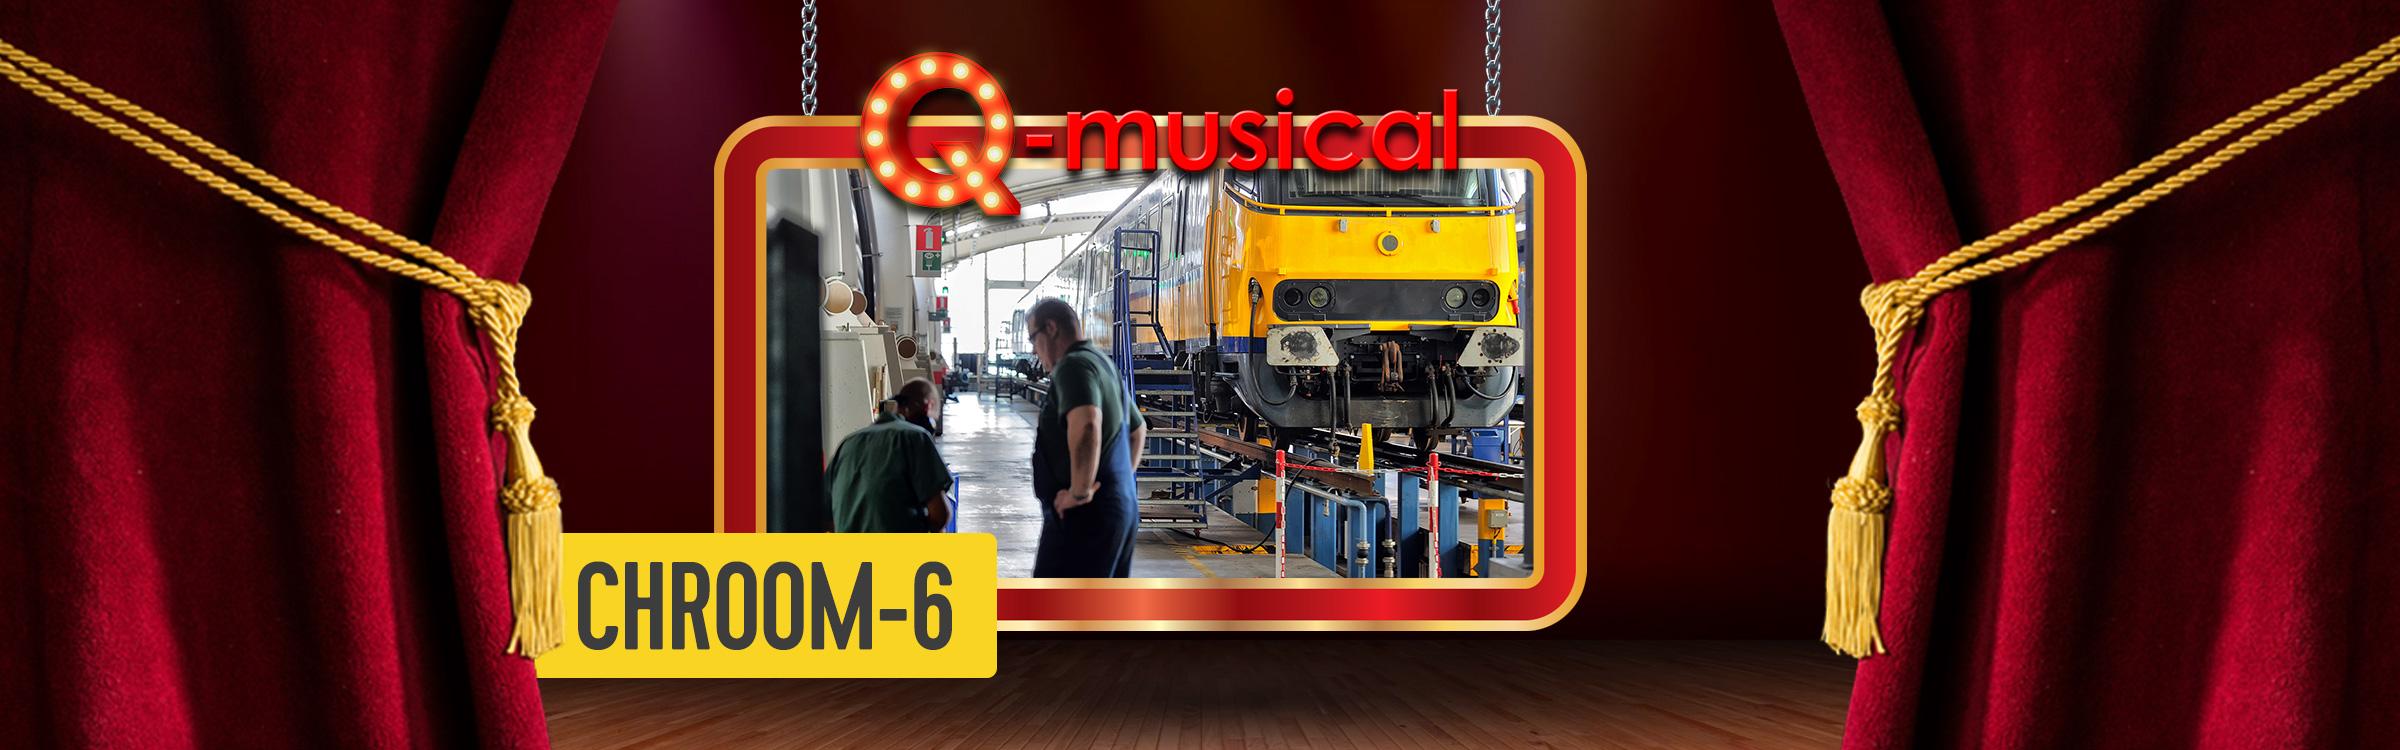 Q musical thumb 2400 750